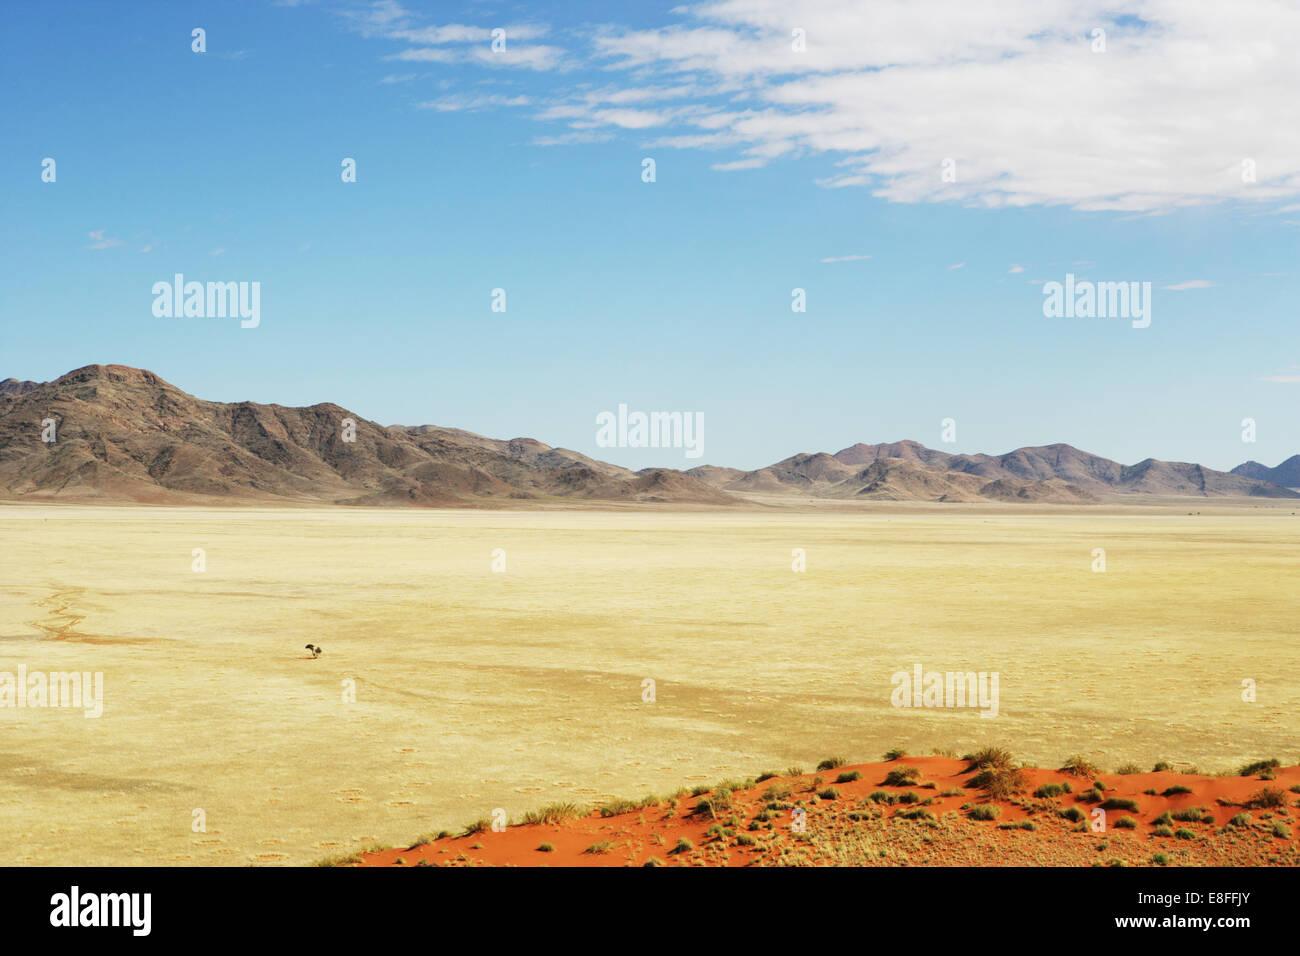 Wüste und Berge Landschaft, Namib-Naukluft-Nationalpark, Namibia Stockbild